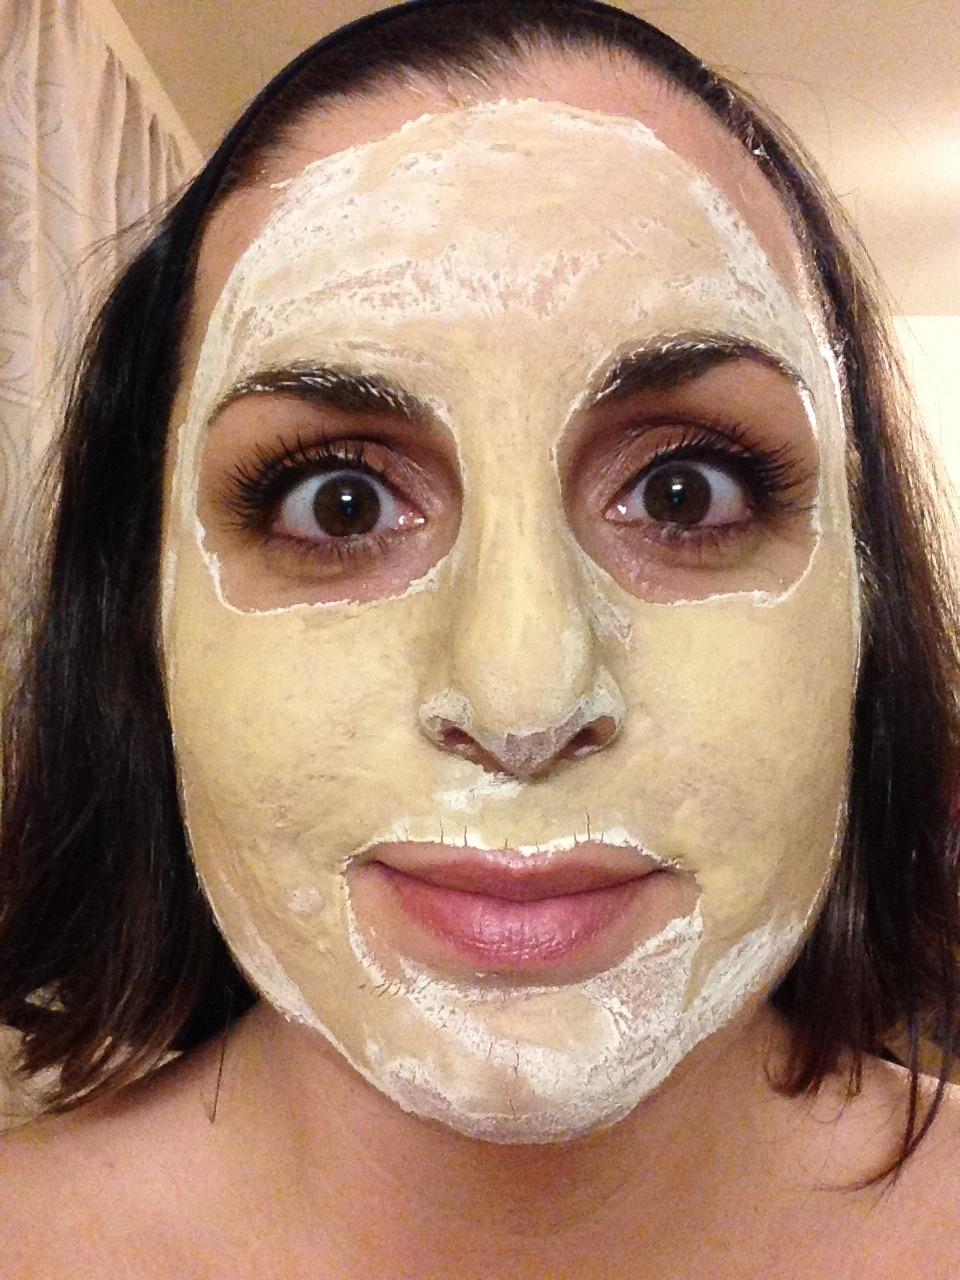 Bryanne wearing the bird poop mask